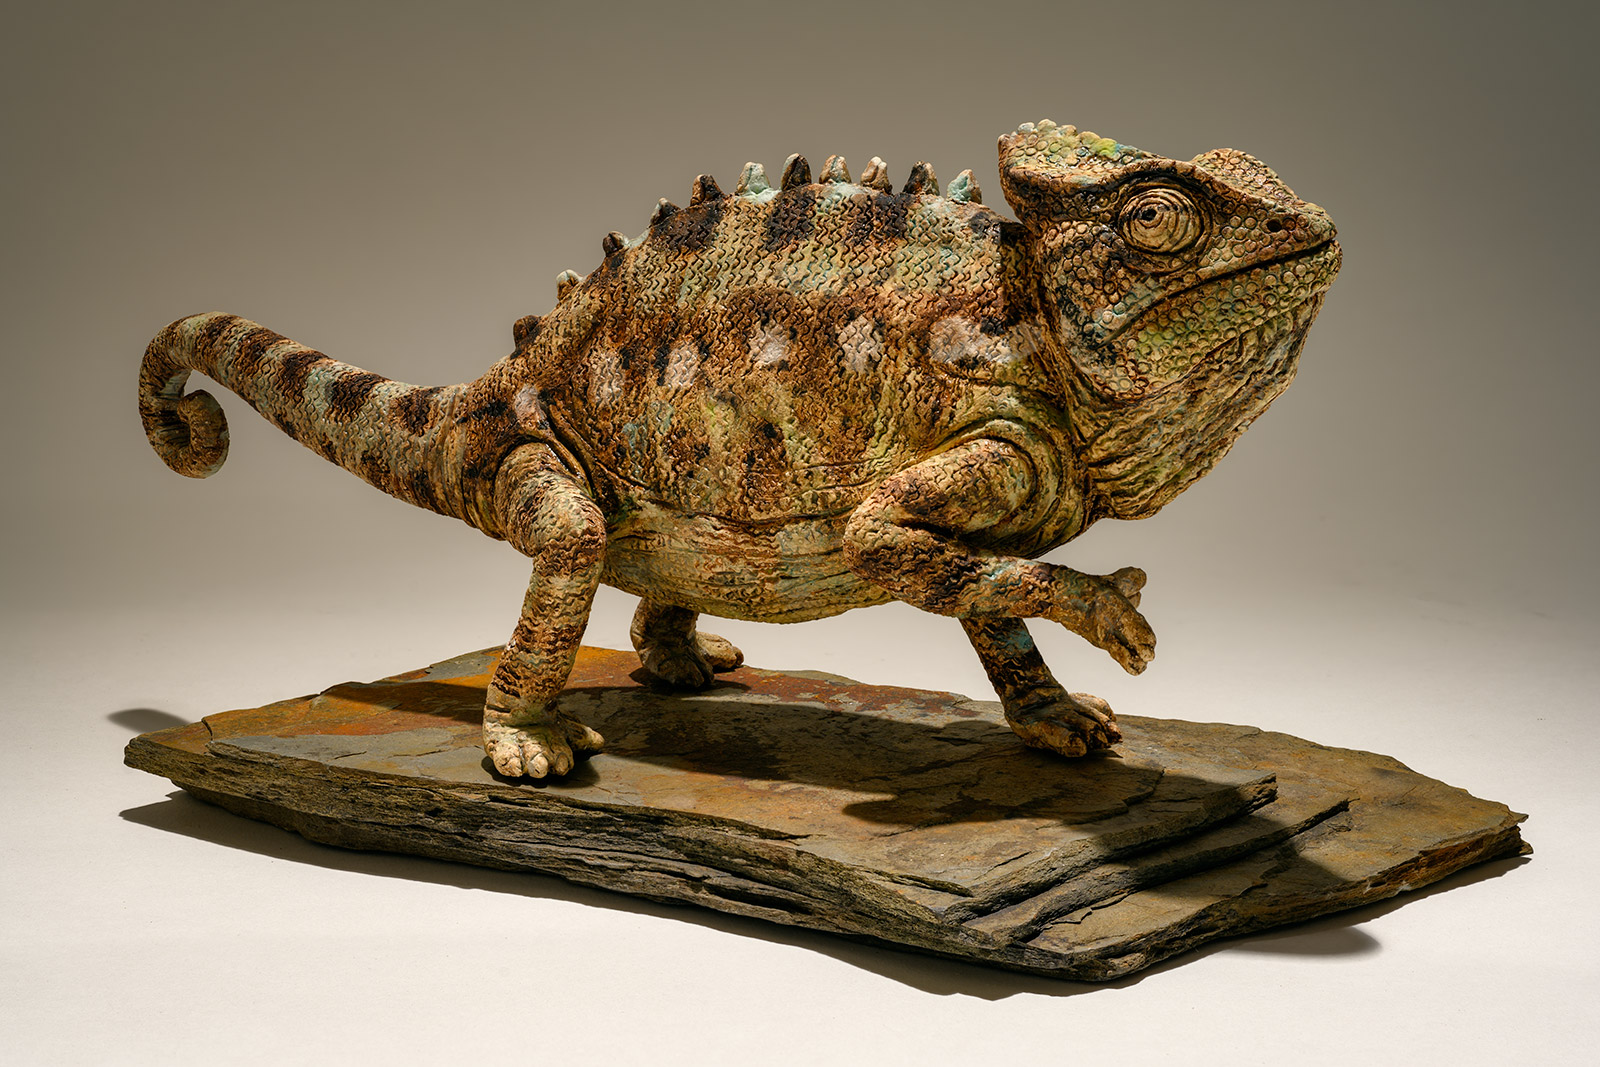 Chameleon Sculpture